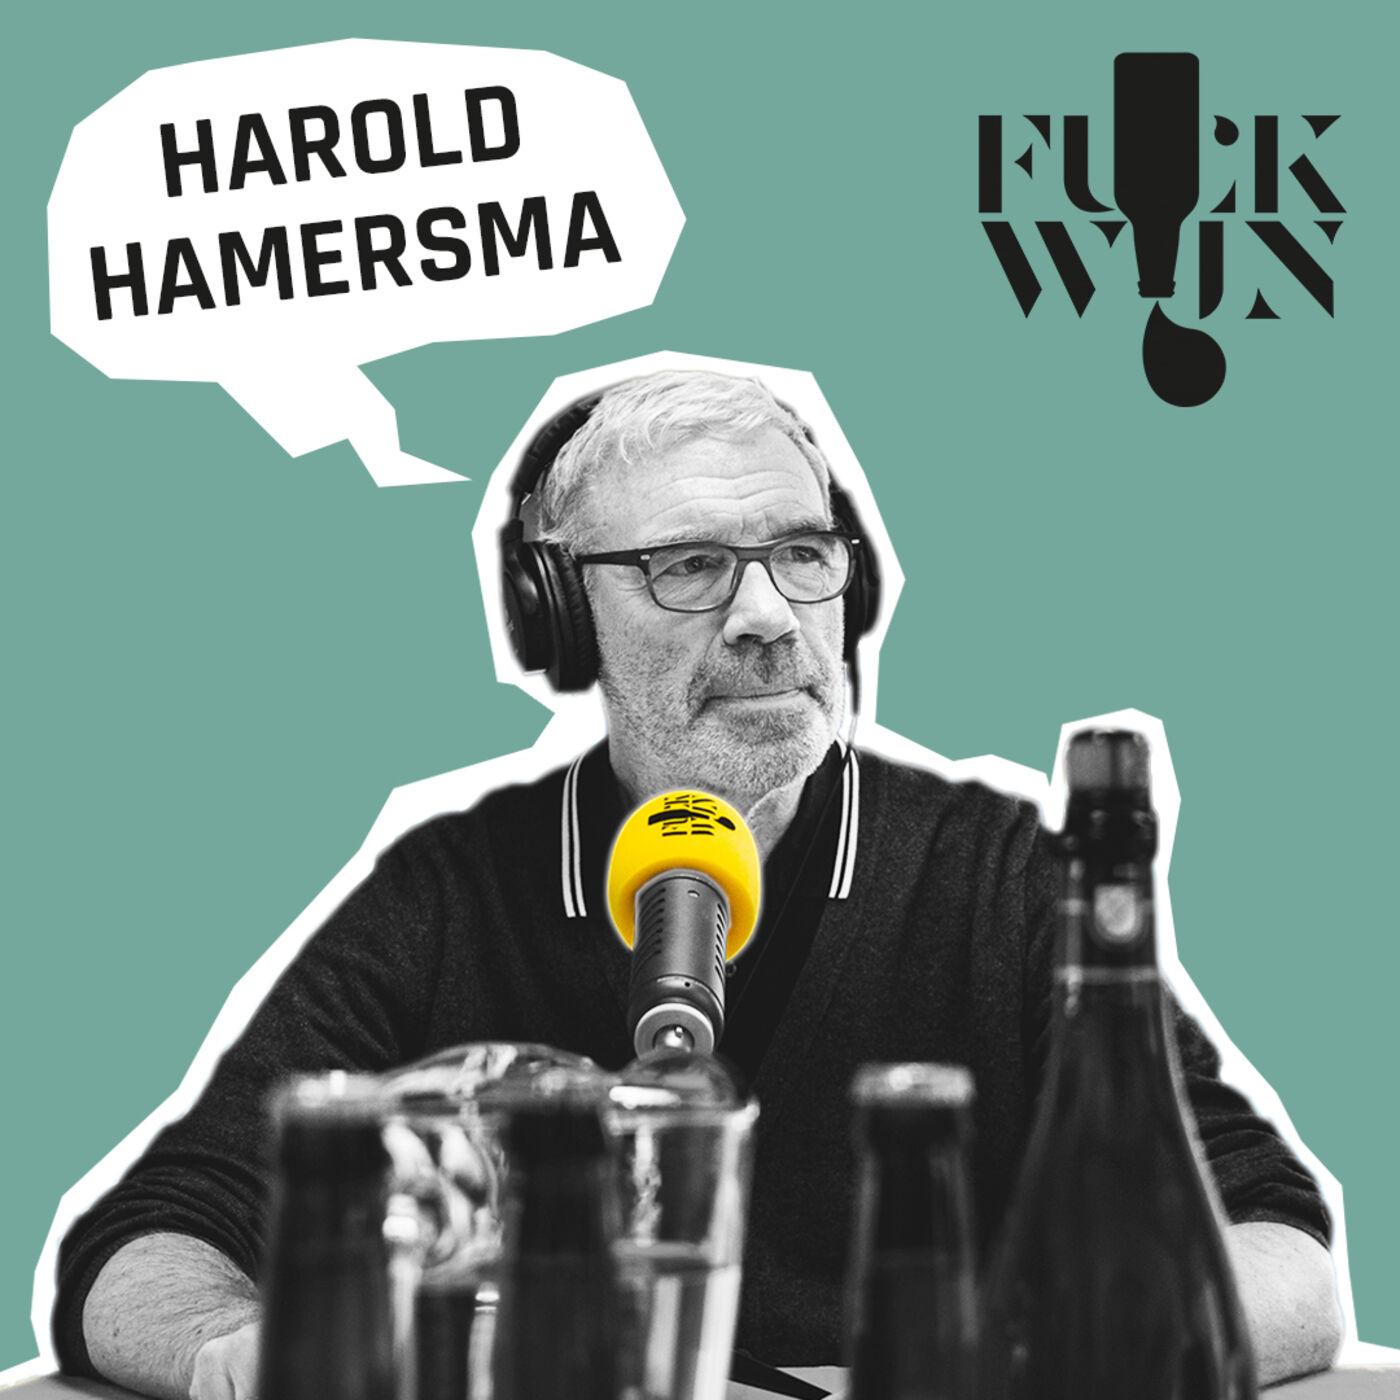 Saison met Harold Hamersma